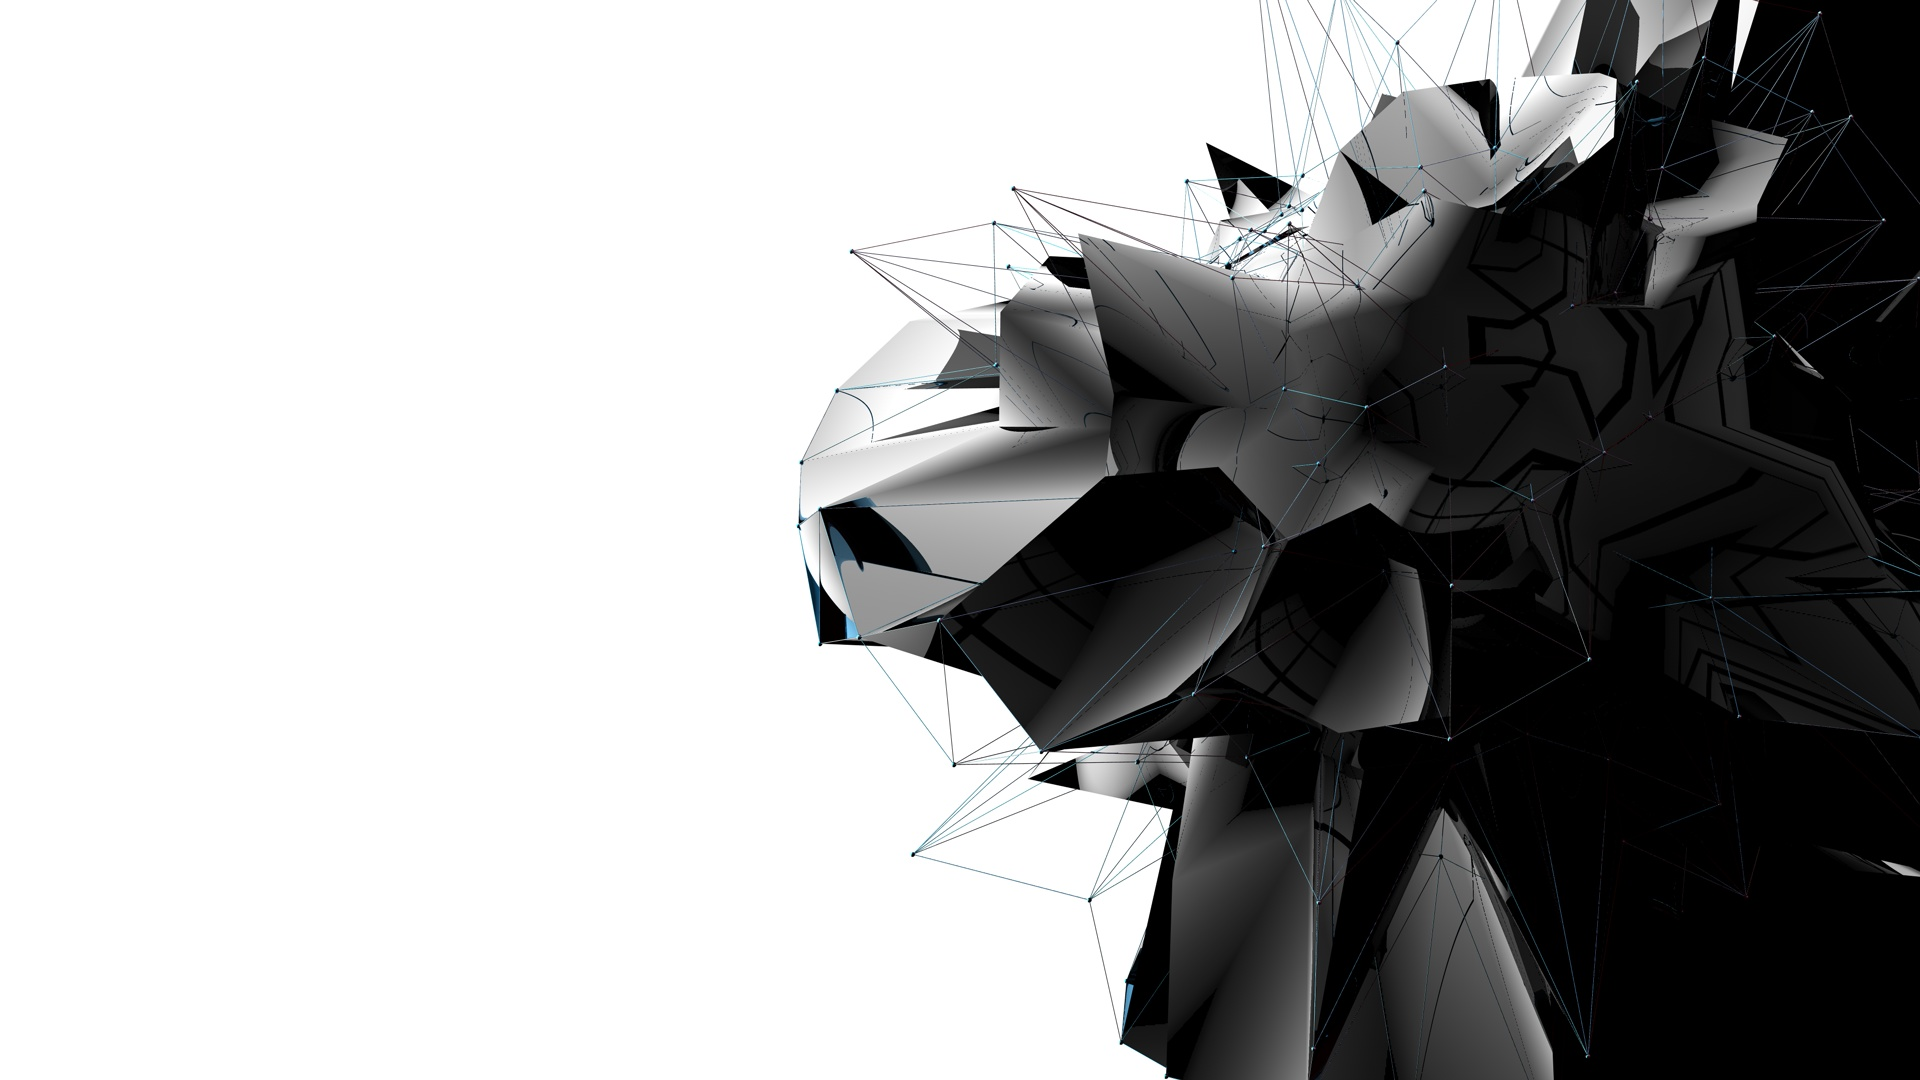 w to b by Steven-Becker